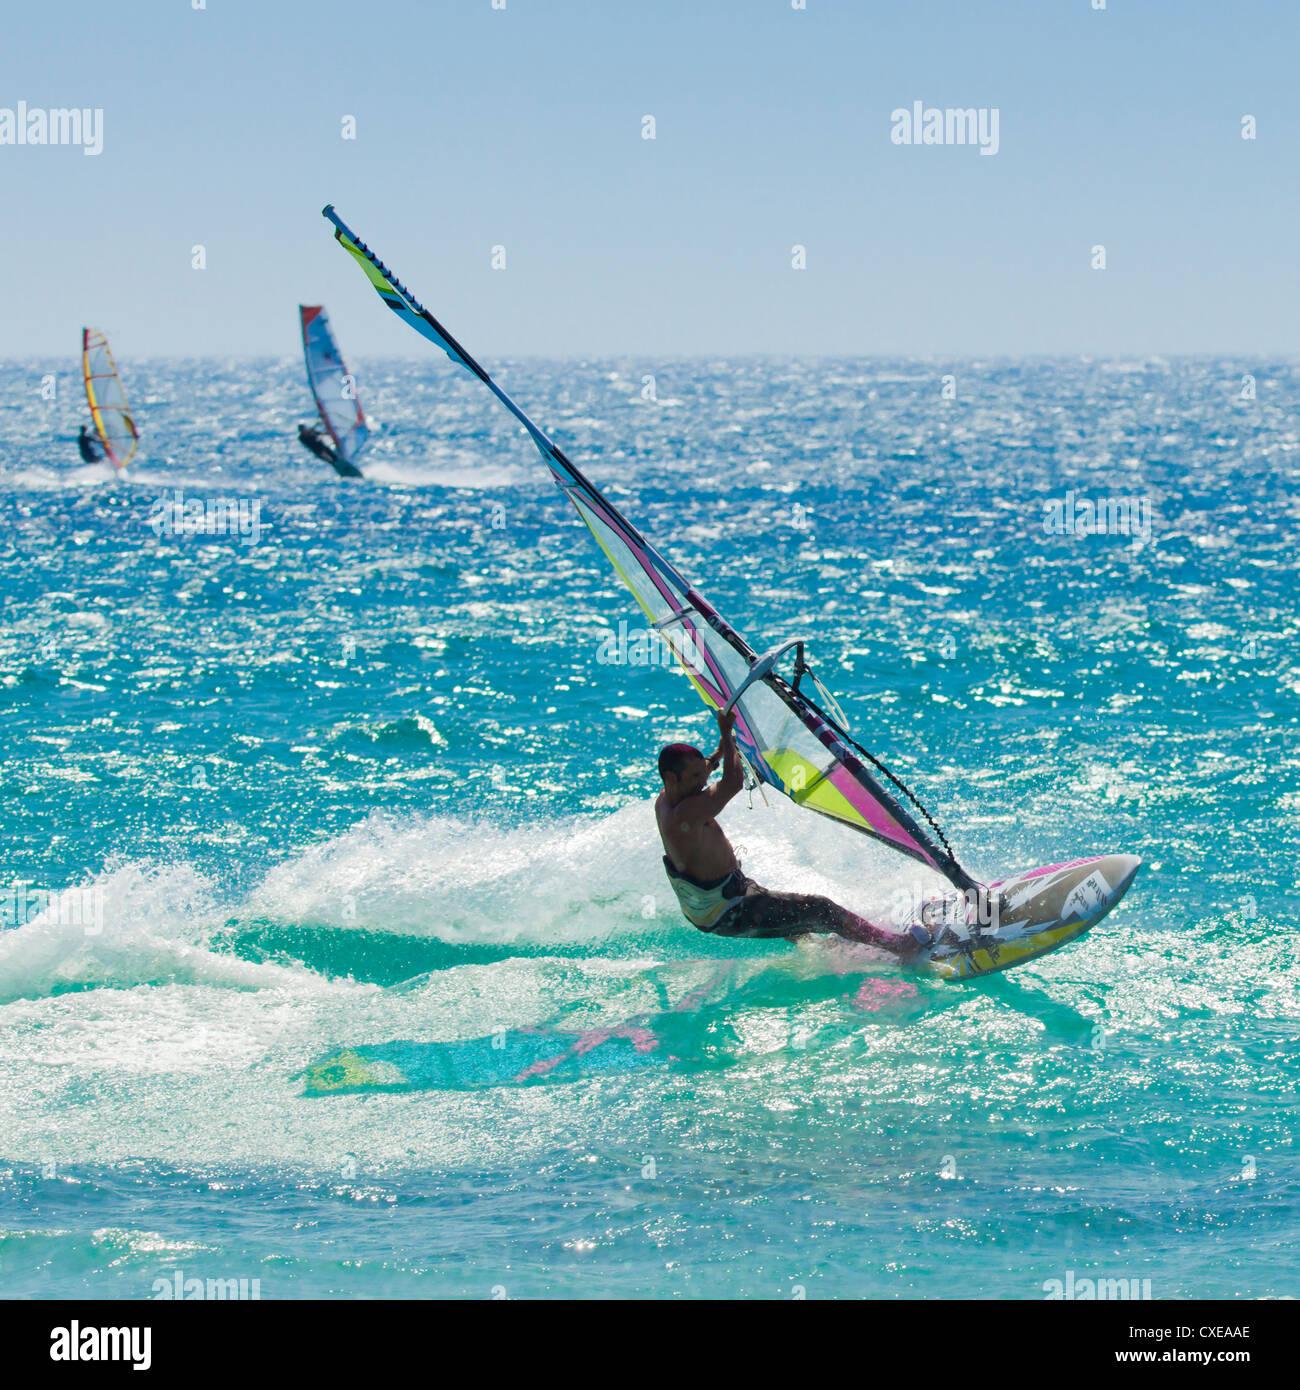 Windsurfer riding wave, Bonlonia, near Tarifa, Costa de la Luz, Andalucia, Spain, Europe Stock Photo